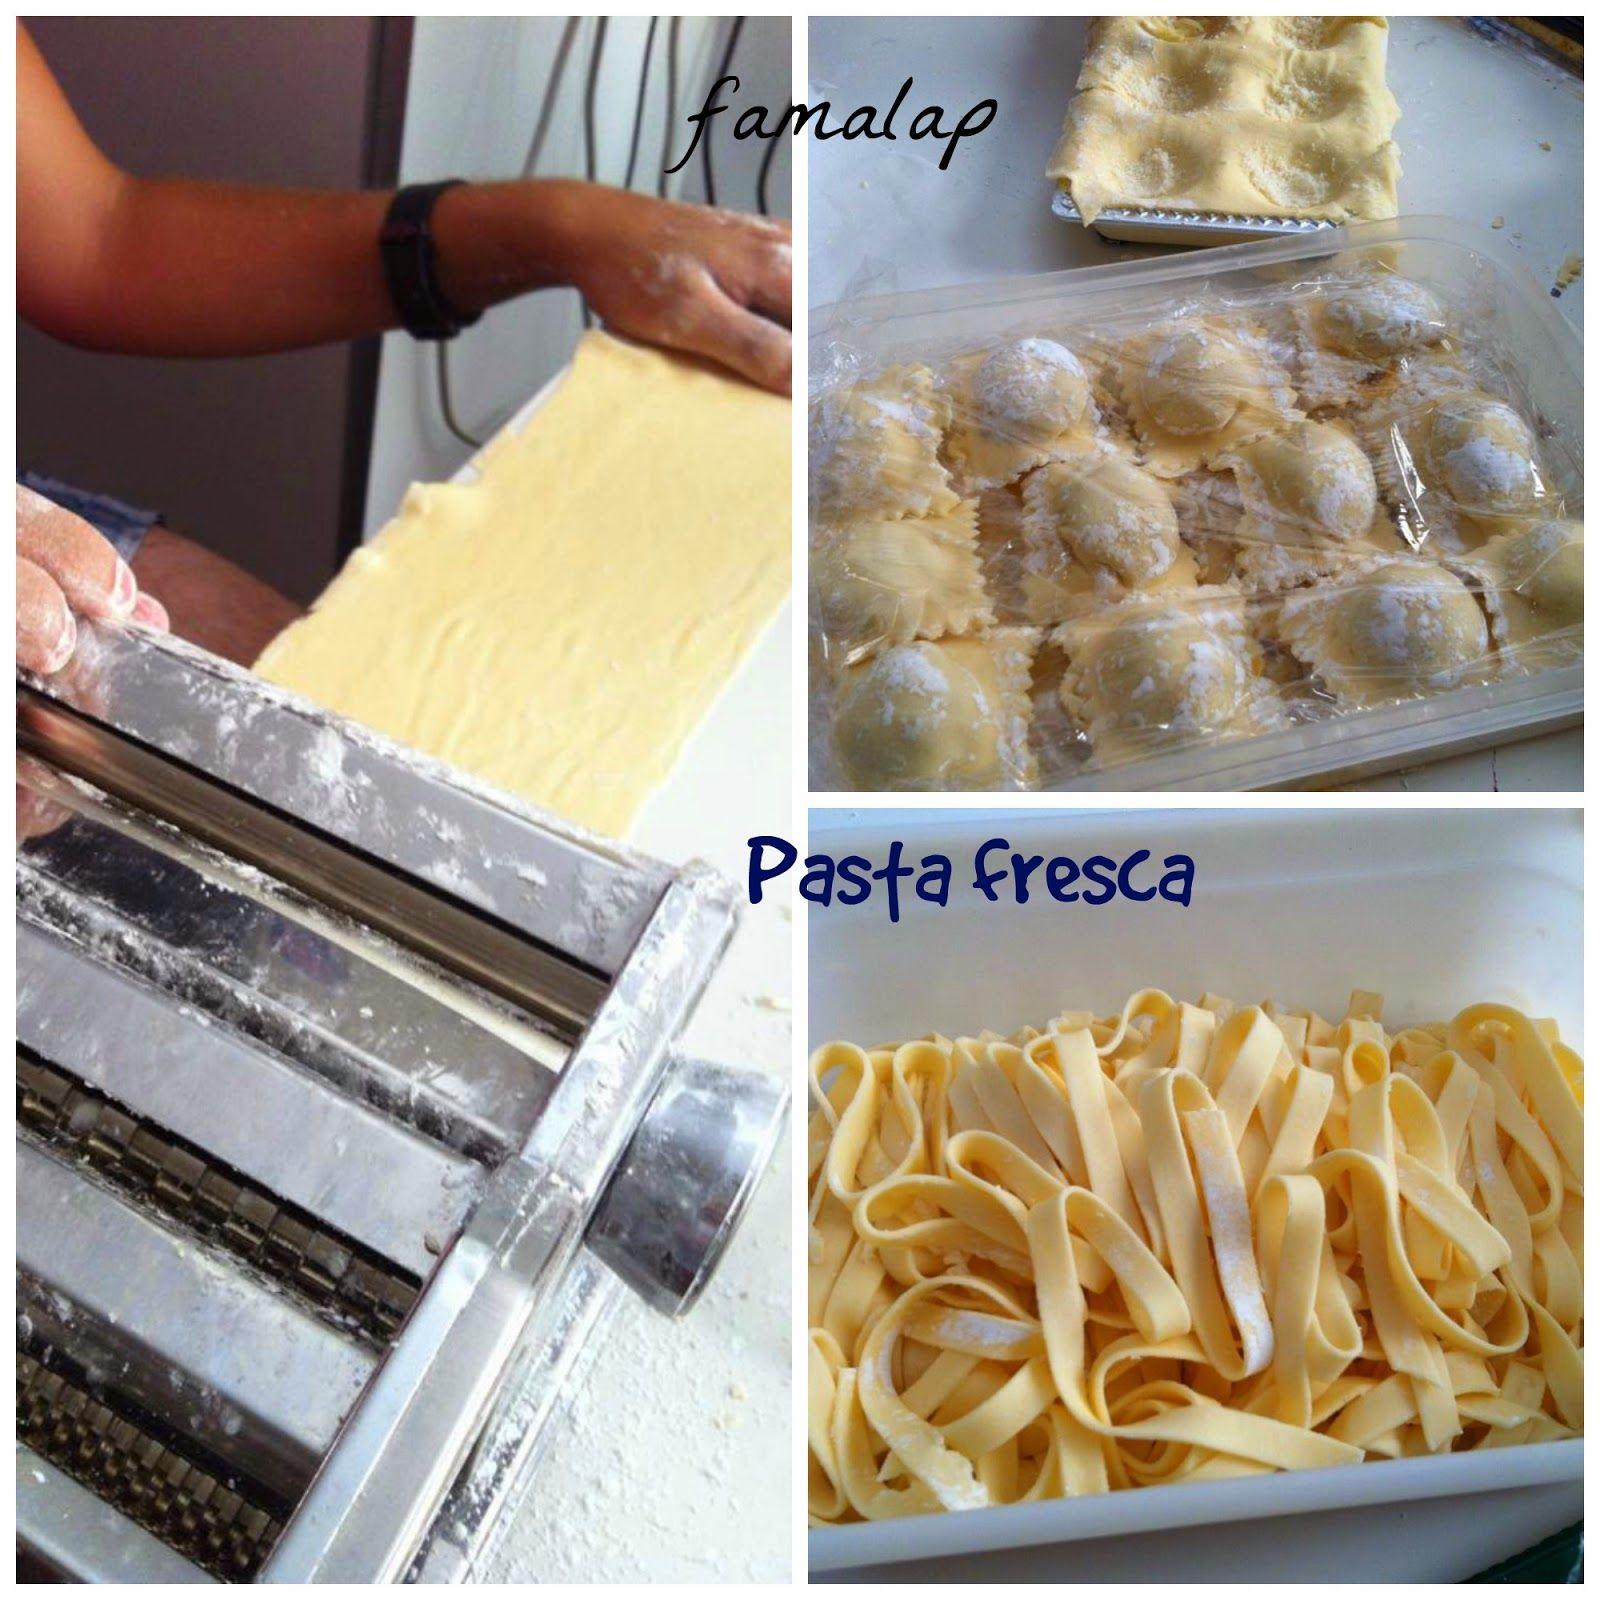 Cocina f cil sin gluten recetas sin gluten gluten y pasta - Cocina facil sin gluten ...